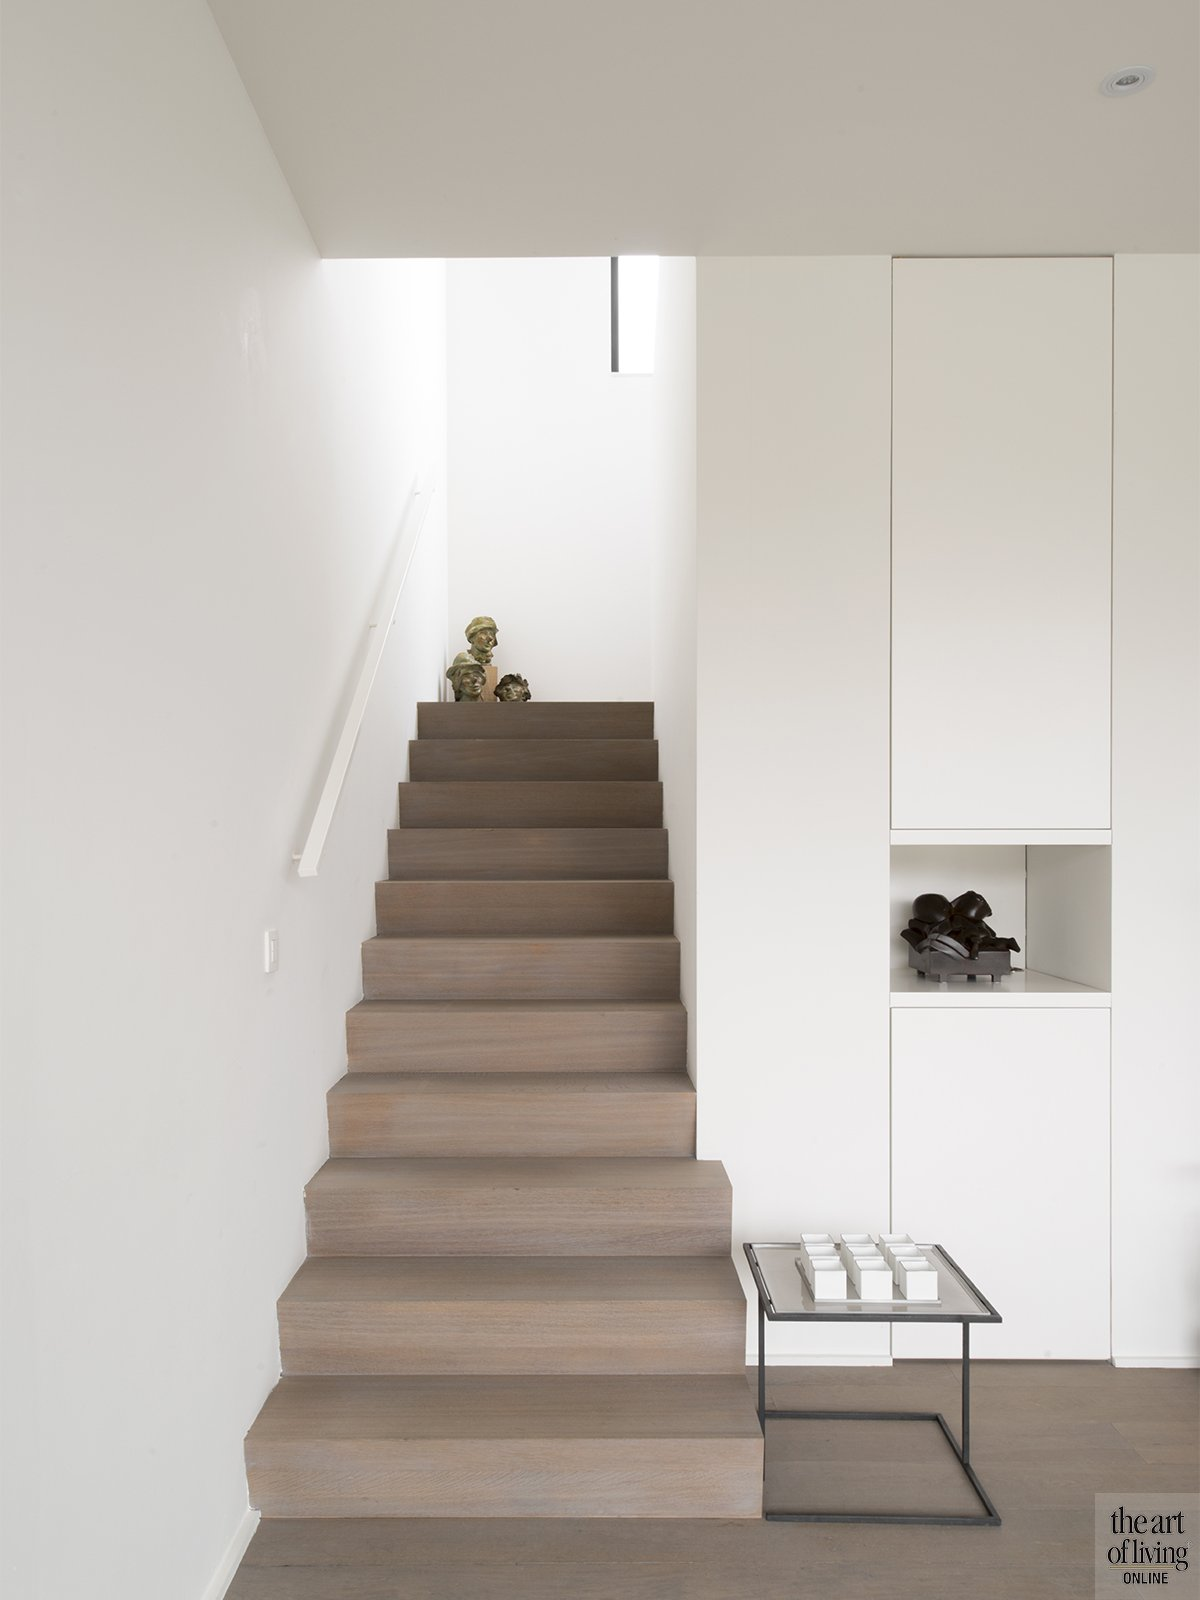 Tijdloos wonen, Kris van den Broeck, Modern interieur, Wit interieur, Strak Interieur, Woonkamer, Trap